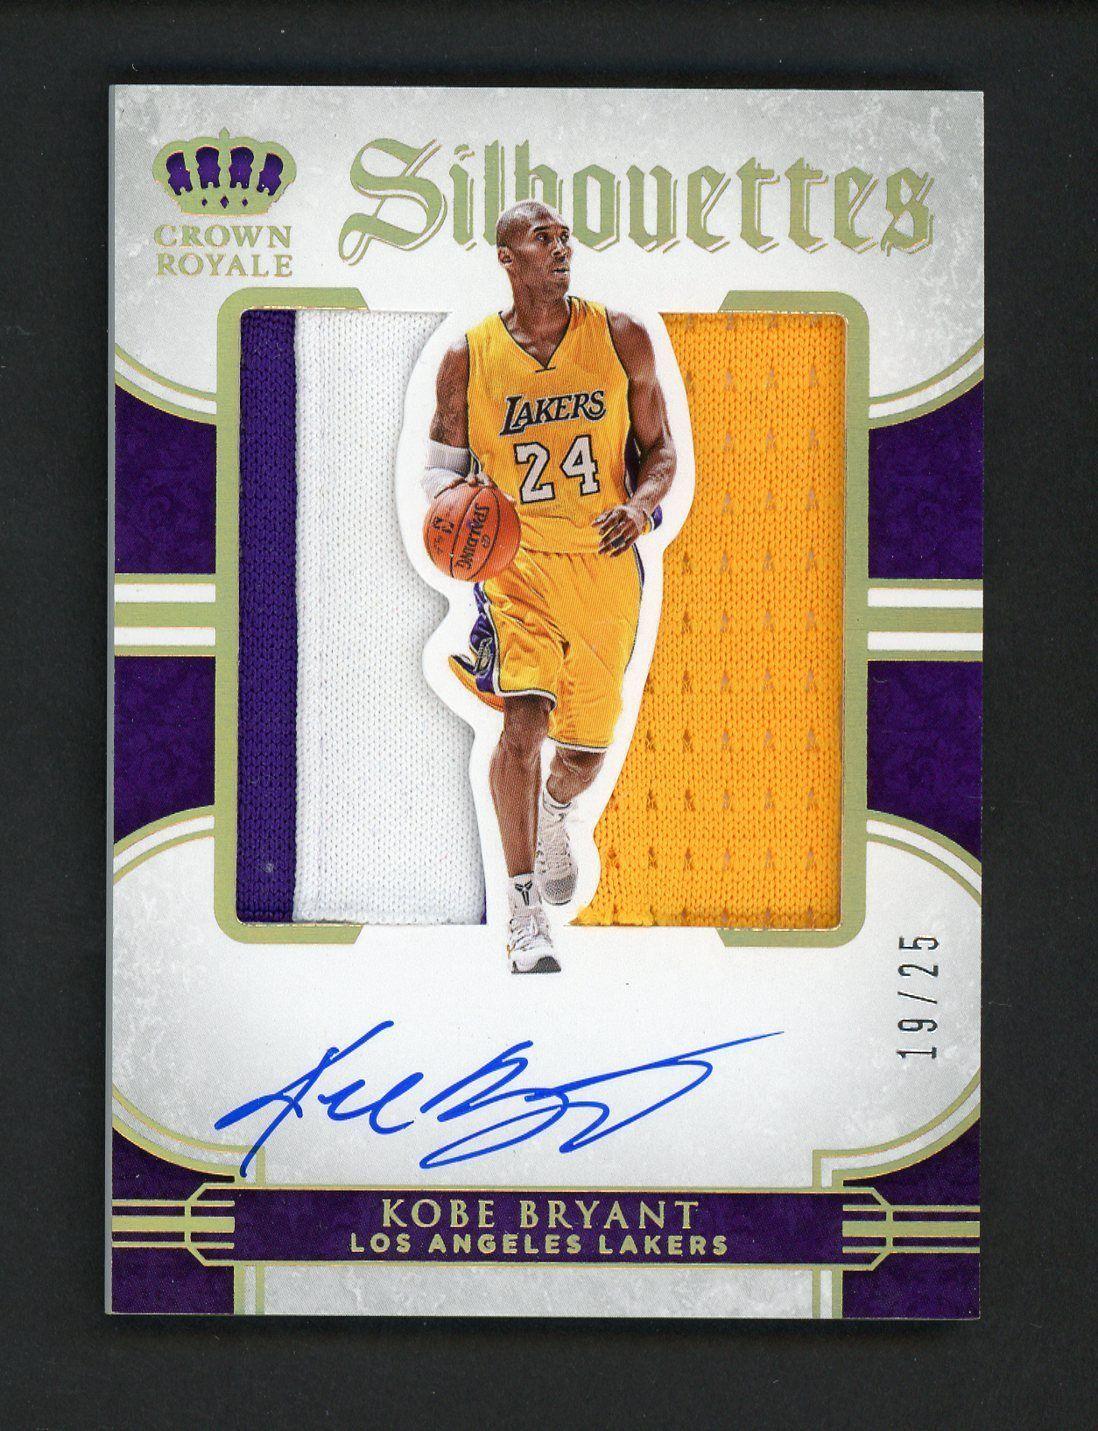 Sportsmemorbilia 2015 16 Preferred Silhouettes Kobe Bryant Lakers Jumbo 3 Color Patch Auto 19 25 Colle Basketball Cards Kobe Bryant Los Angeles Bryant Lakers